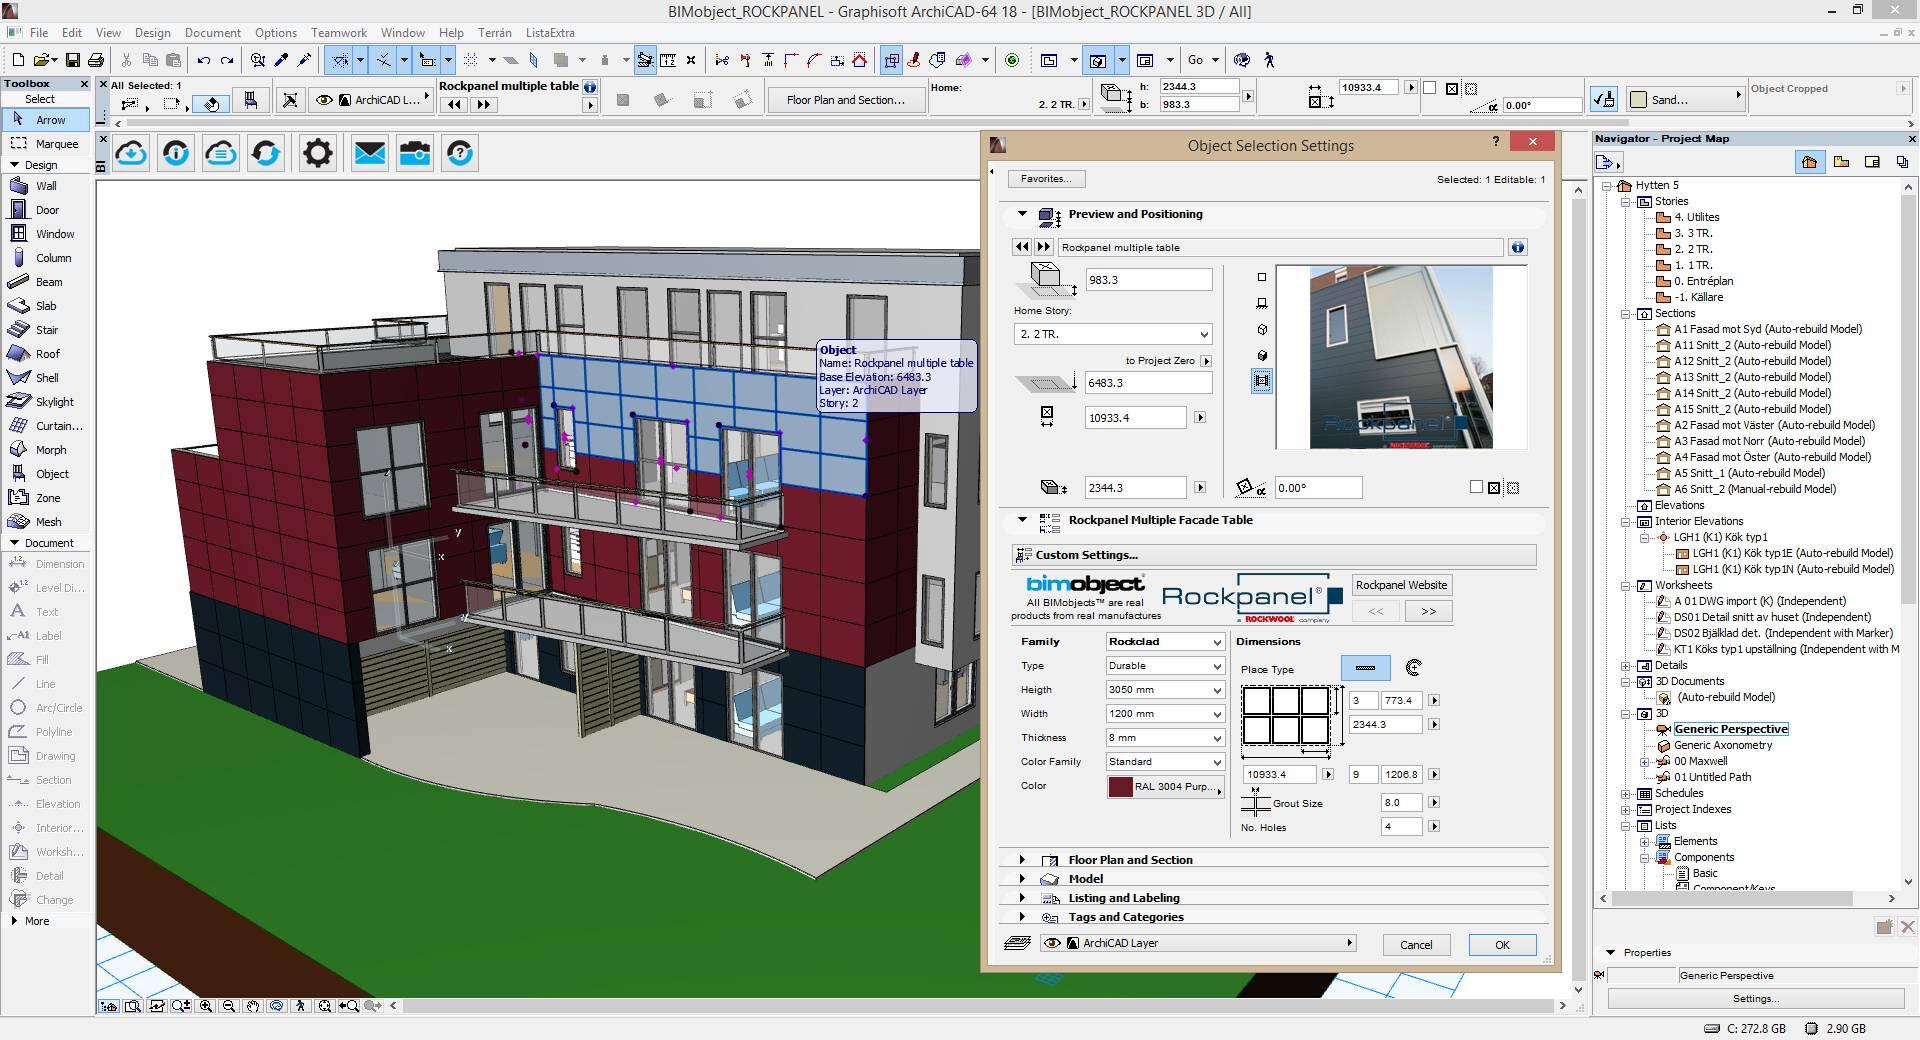 BIM data files for all ROCKPANEL® façade panels